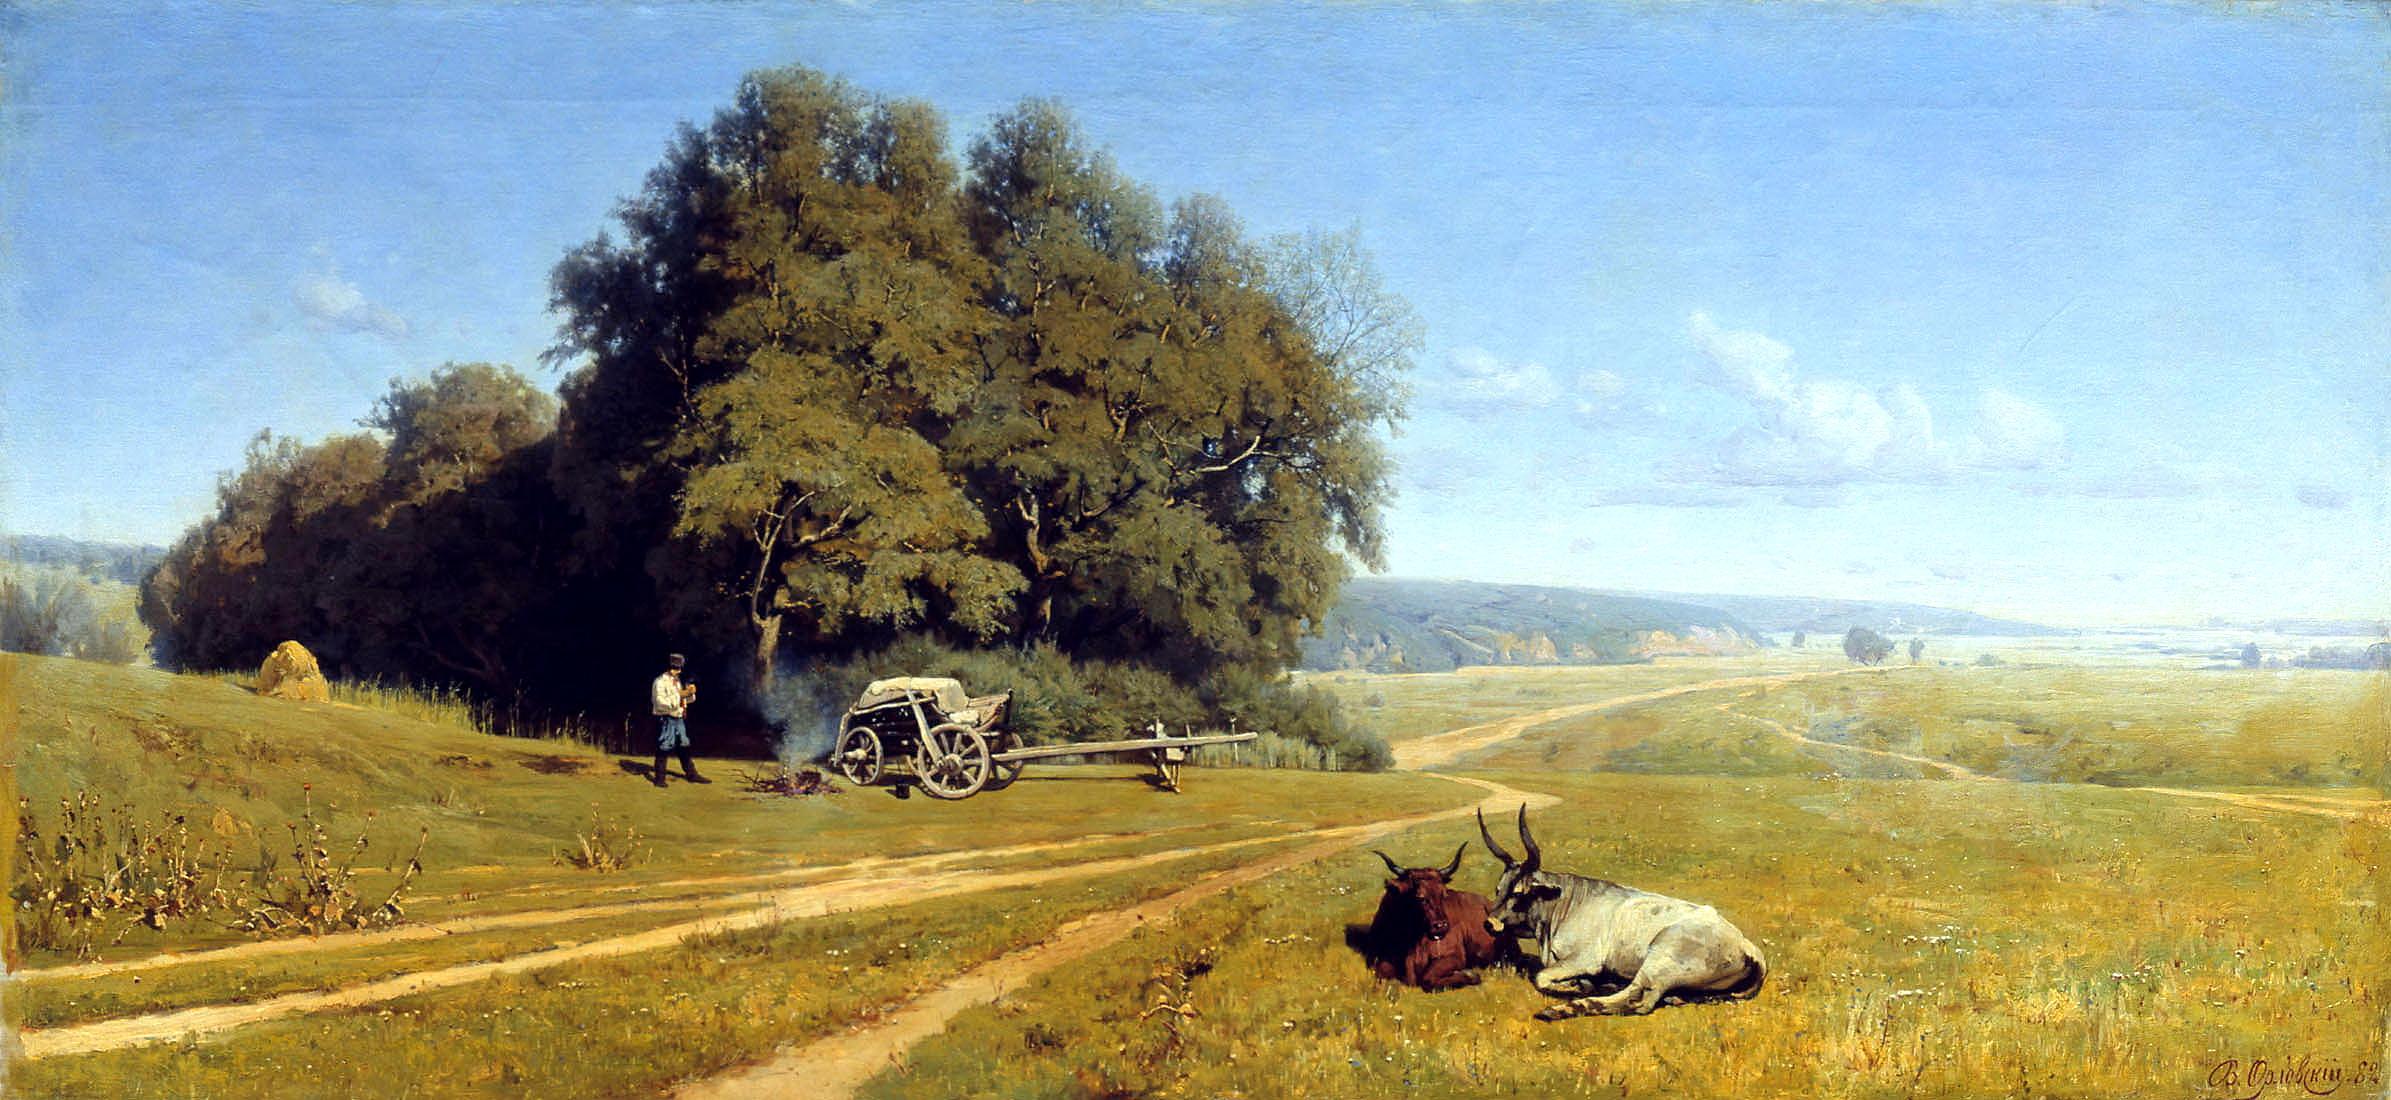 1385139486-orlovskiiy-vladimir---peiyzazh-paysage